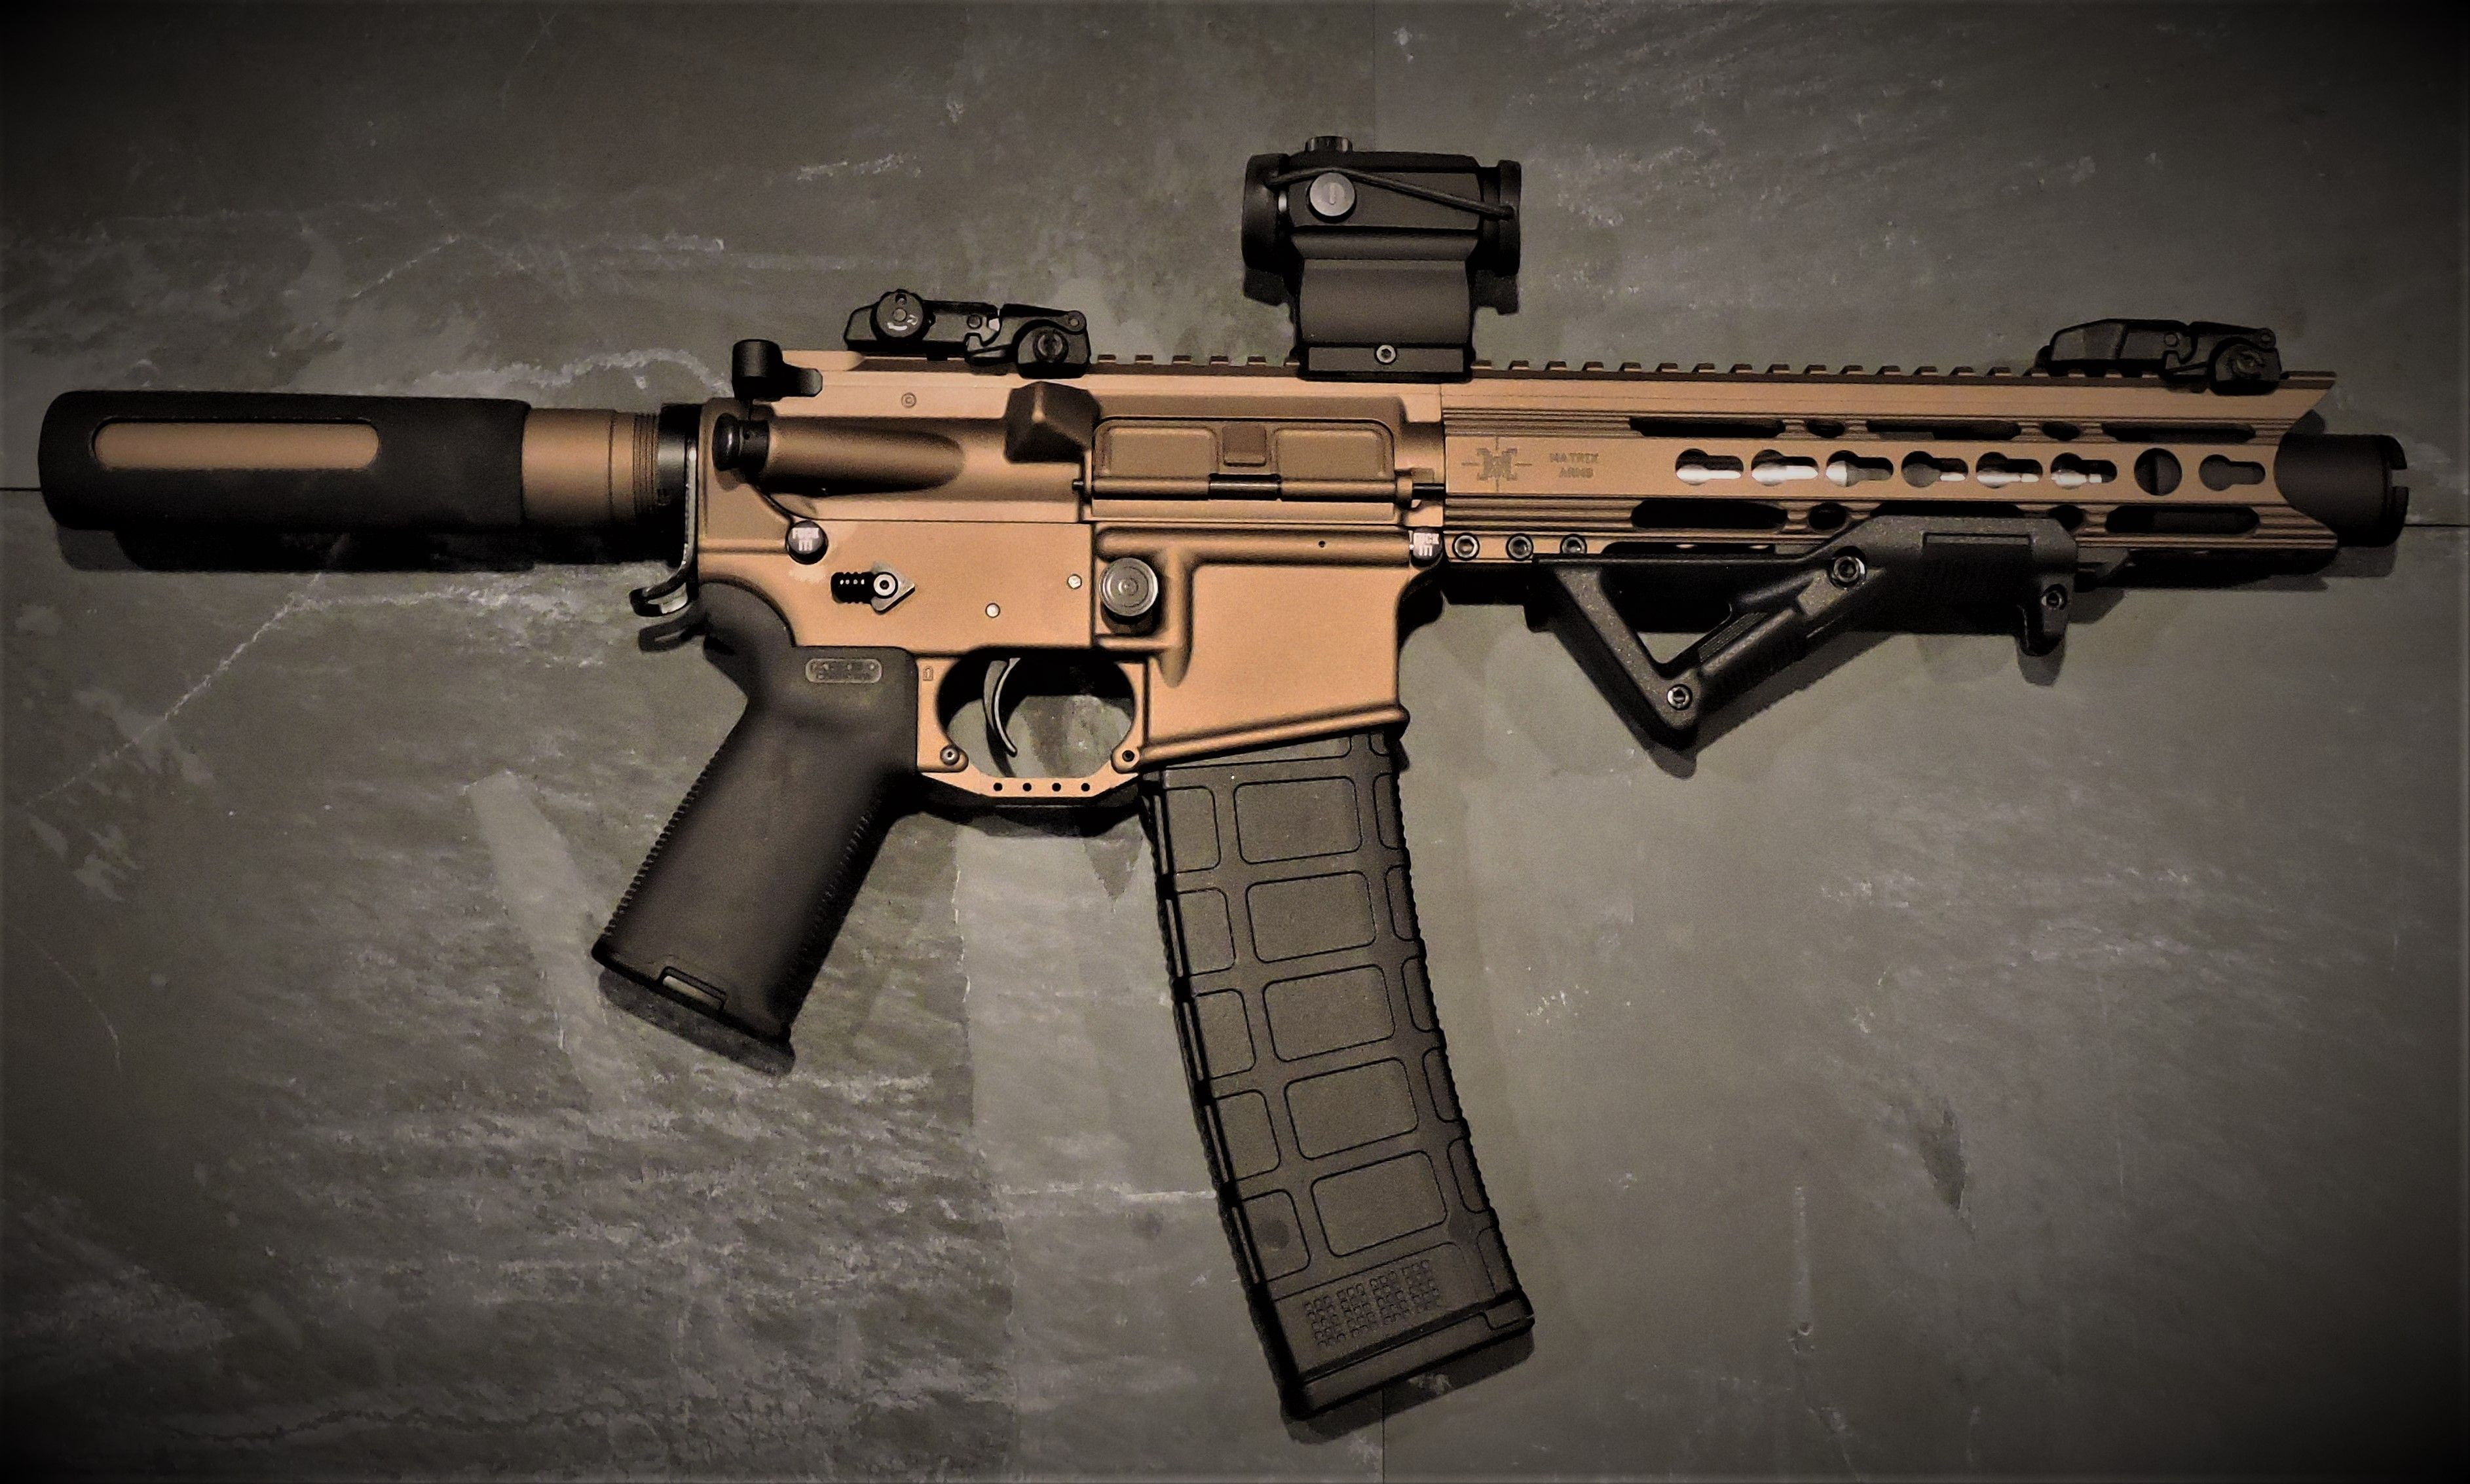 Nerf painted AR pistol | Painted Guns | Pinterest | Ar pistol, Guns ...